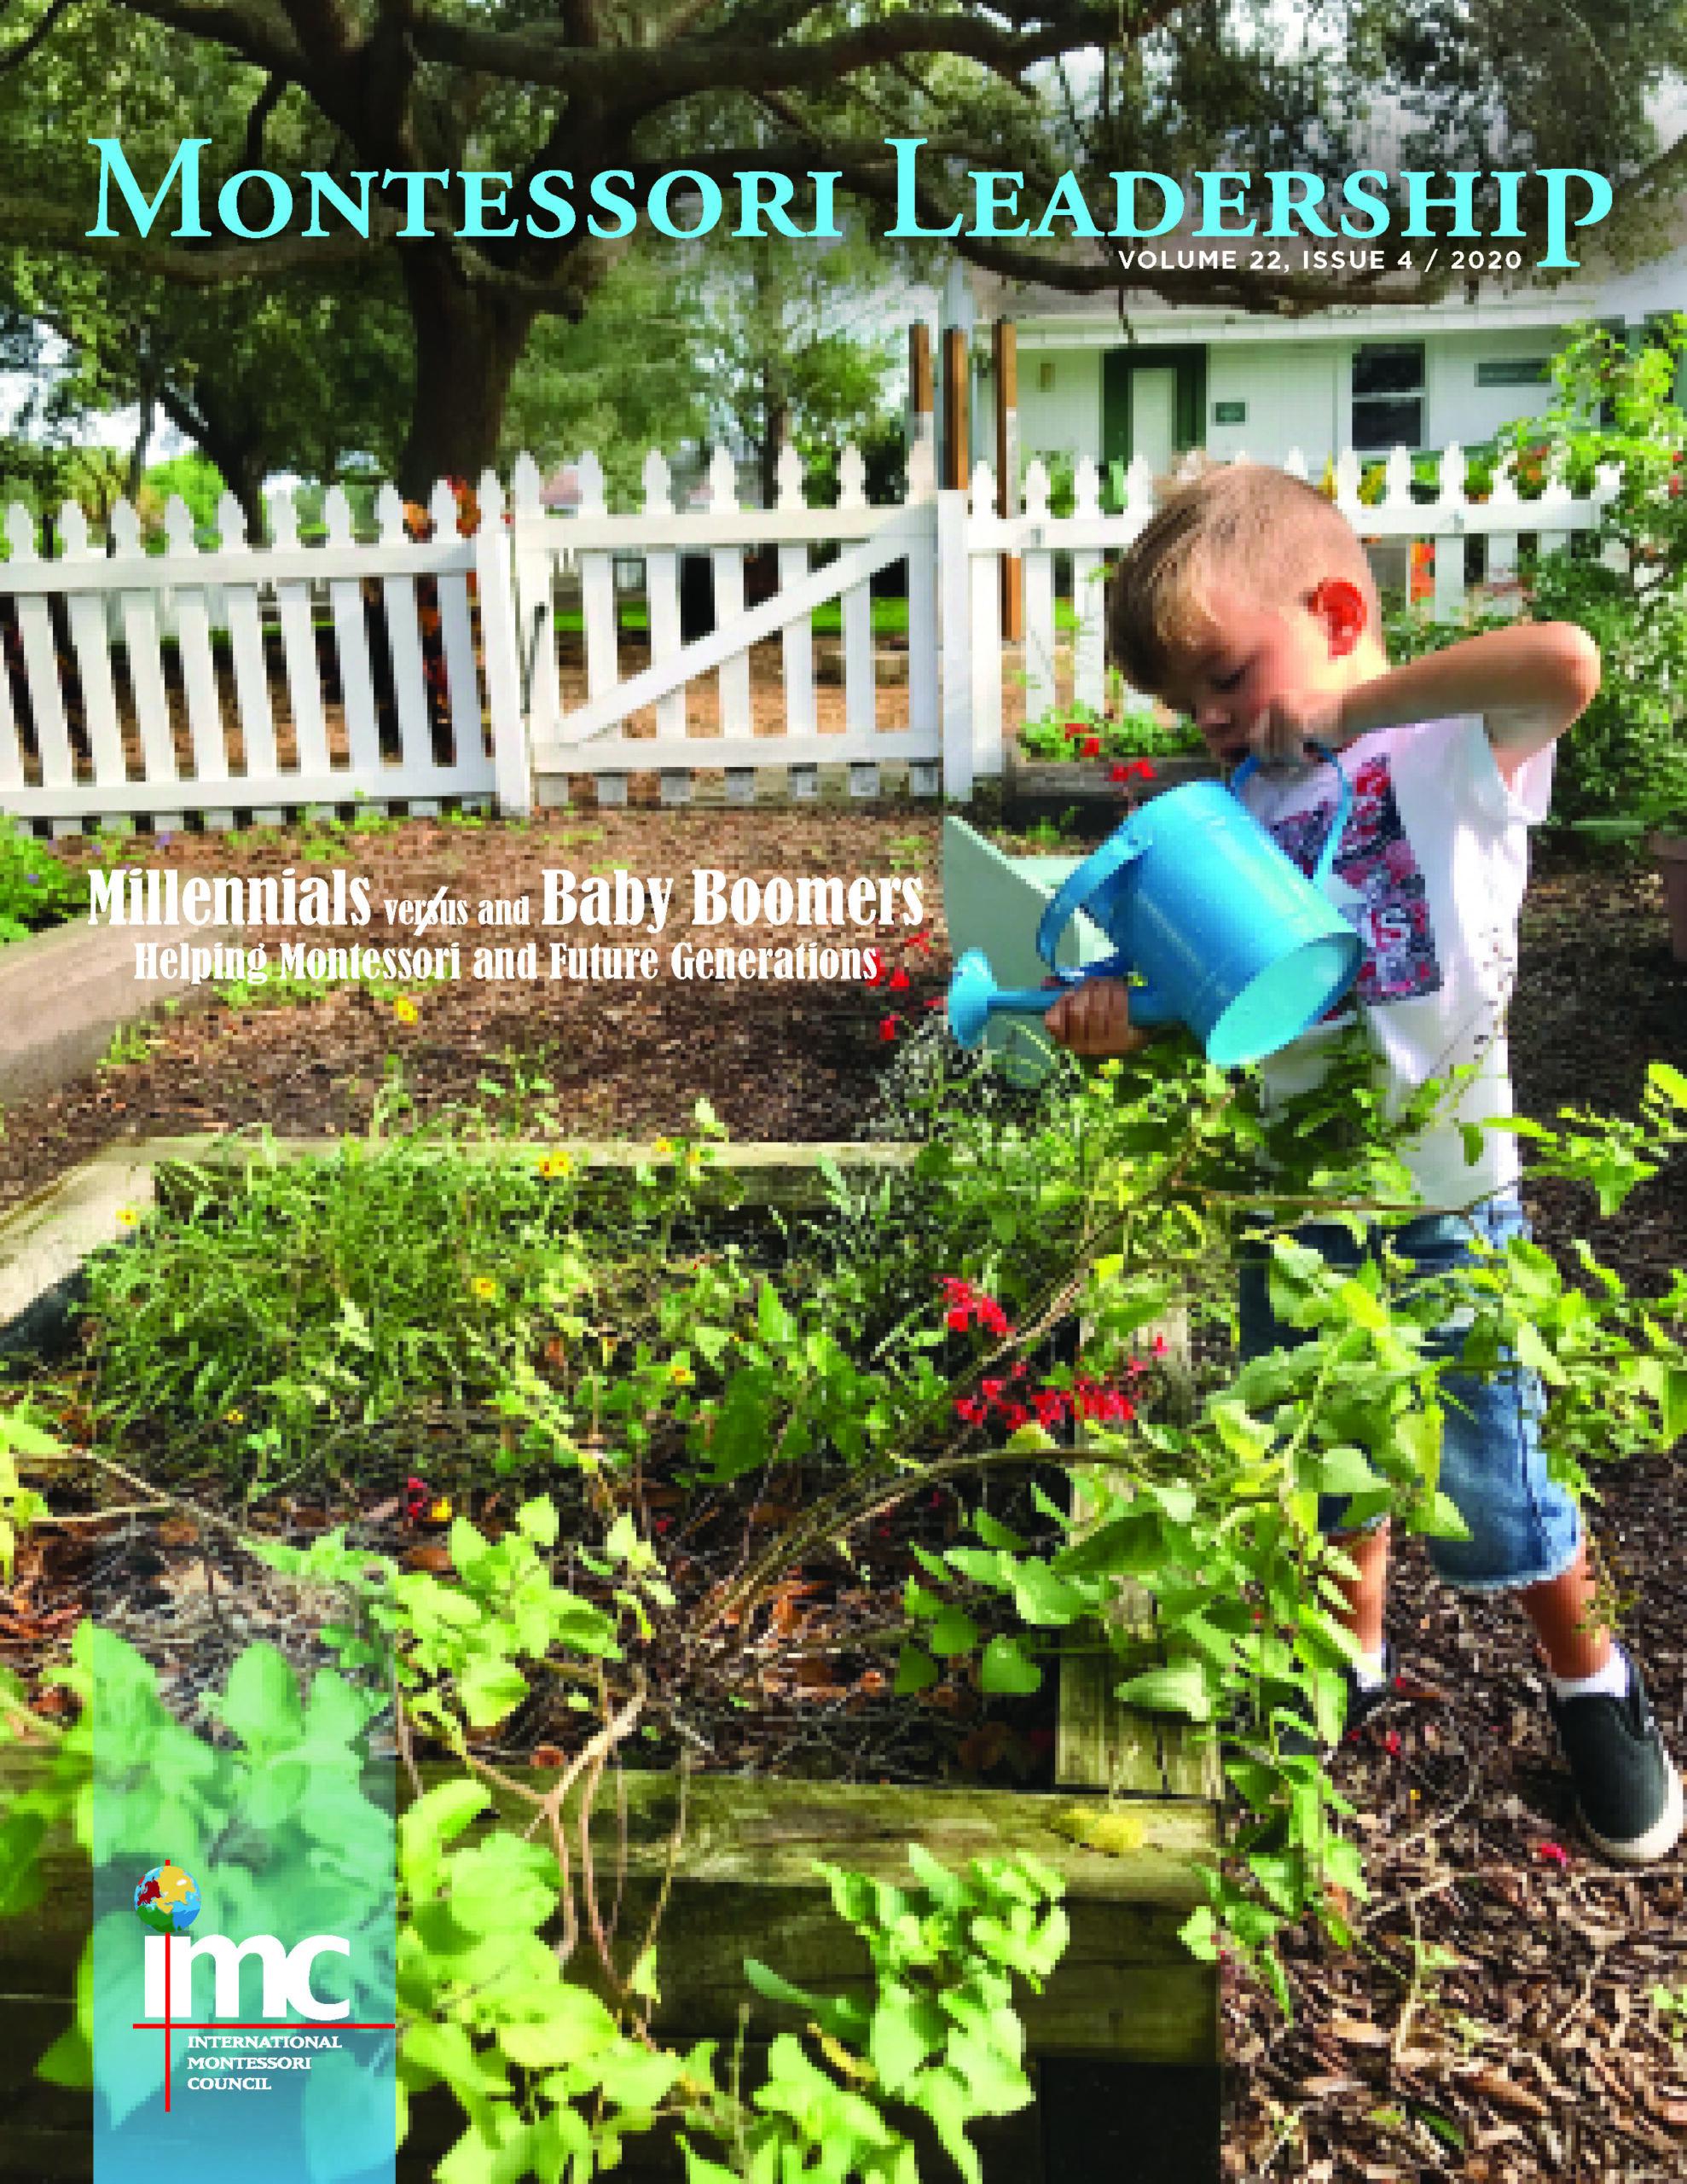 Montessori Leadership | Volume 22 | Issue 4 | 2020